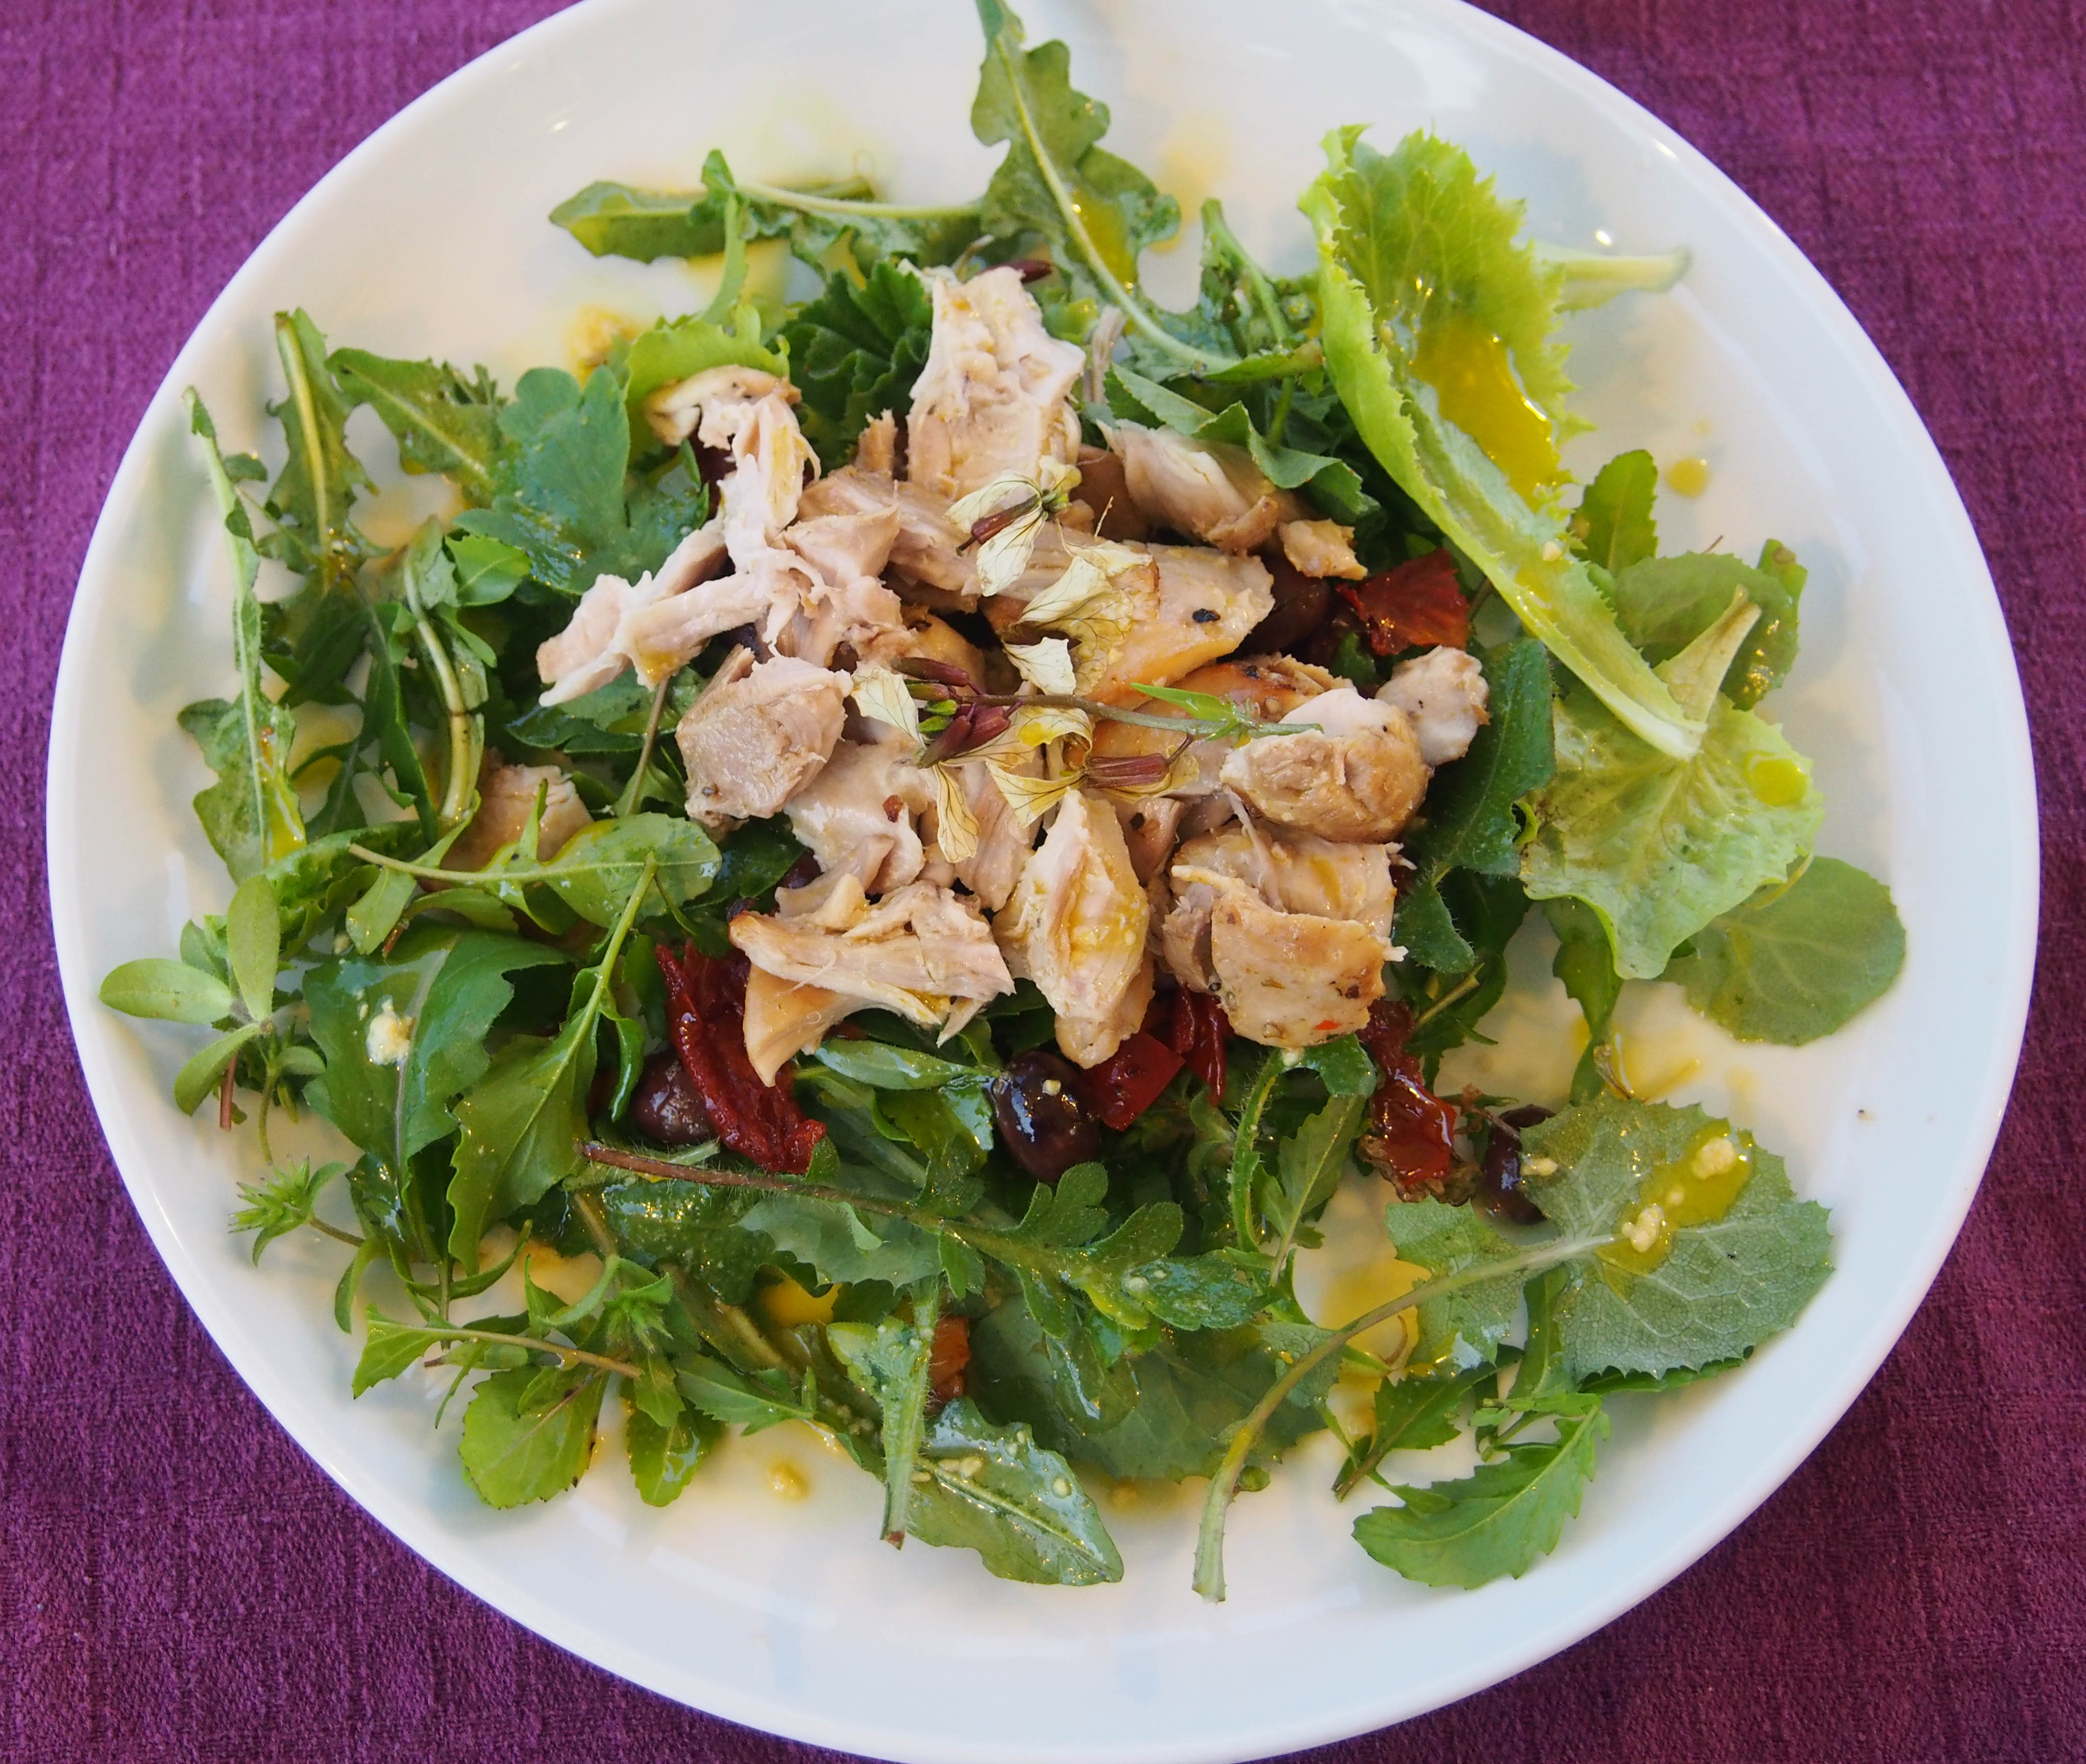 Wild lettuce salad